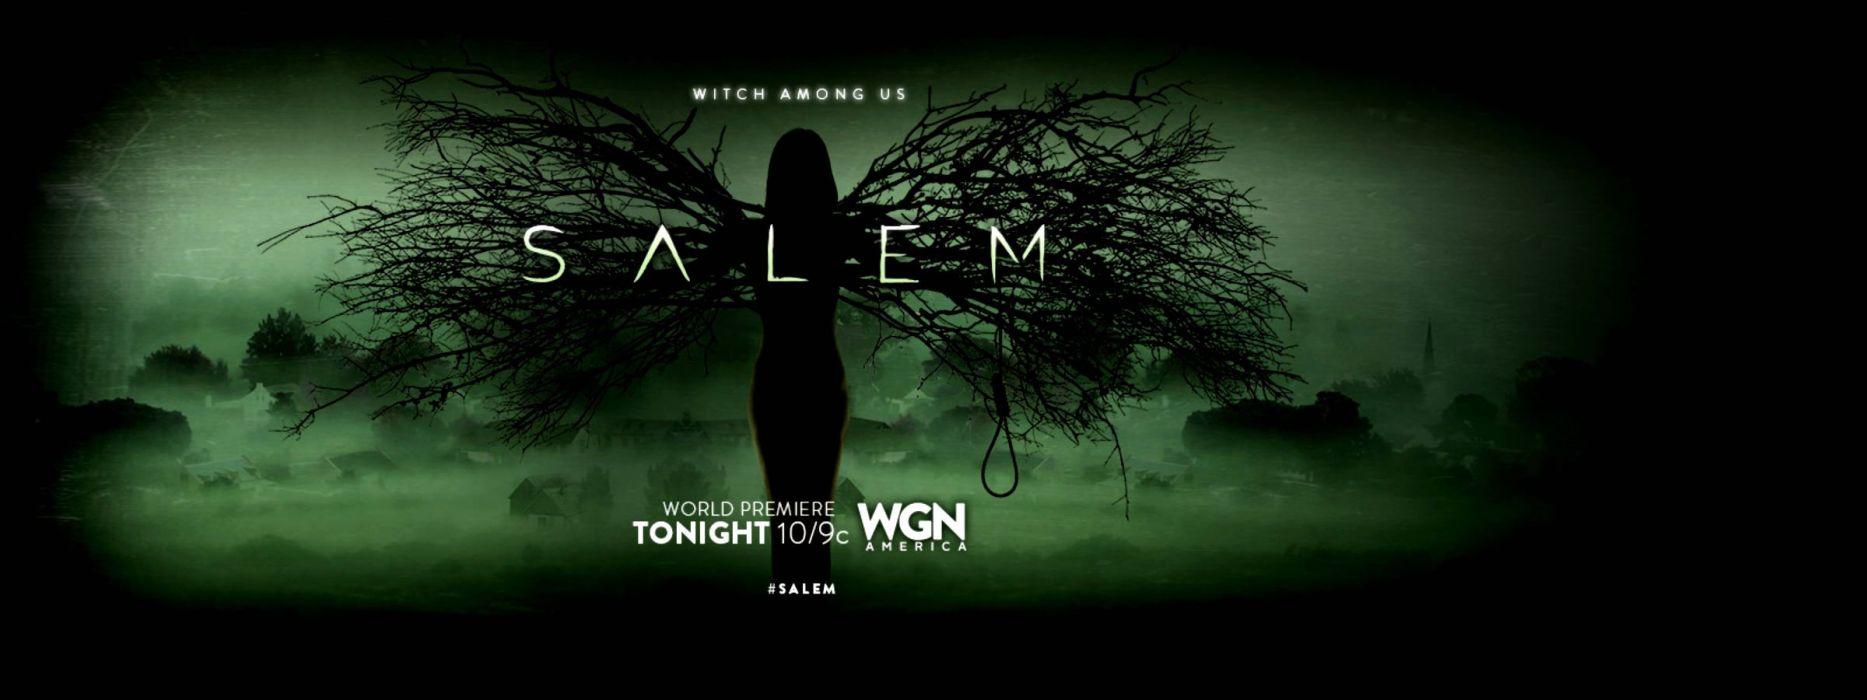 SALEM drama thriller fantasy dark witch history series television (38) wallpaper